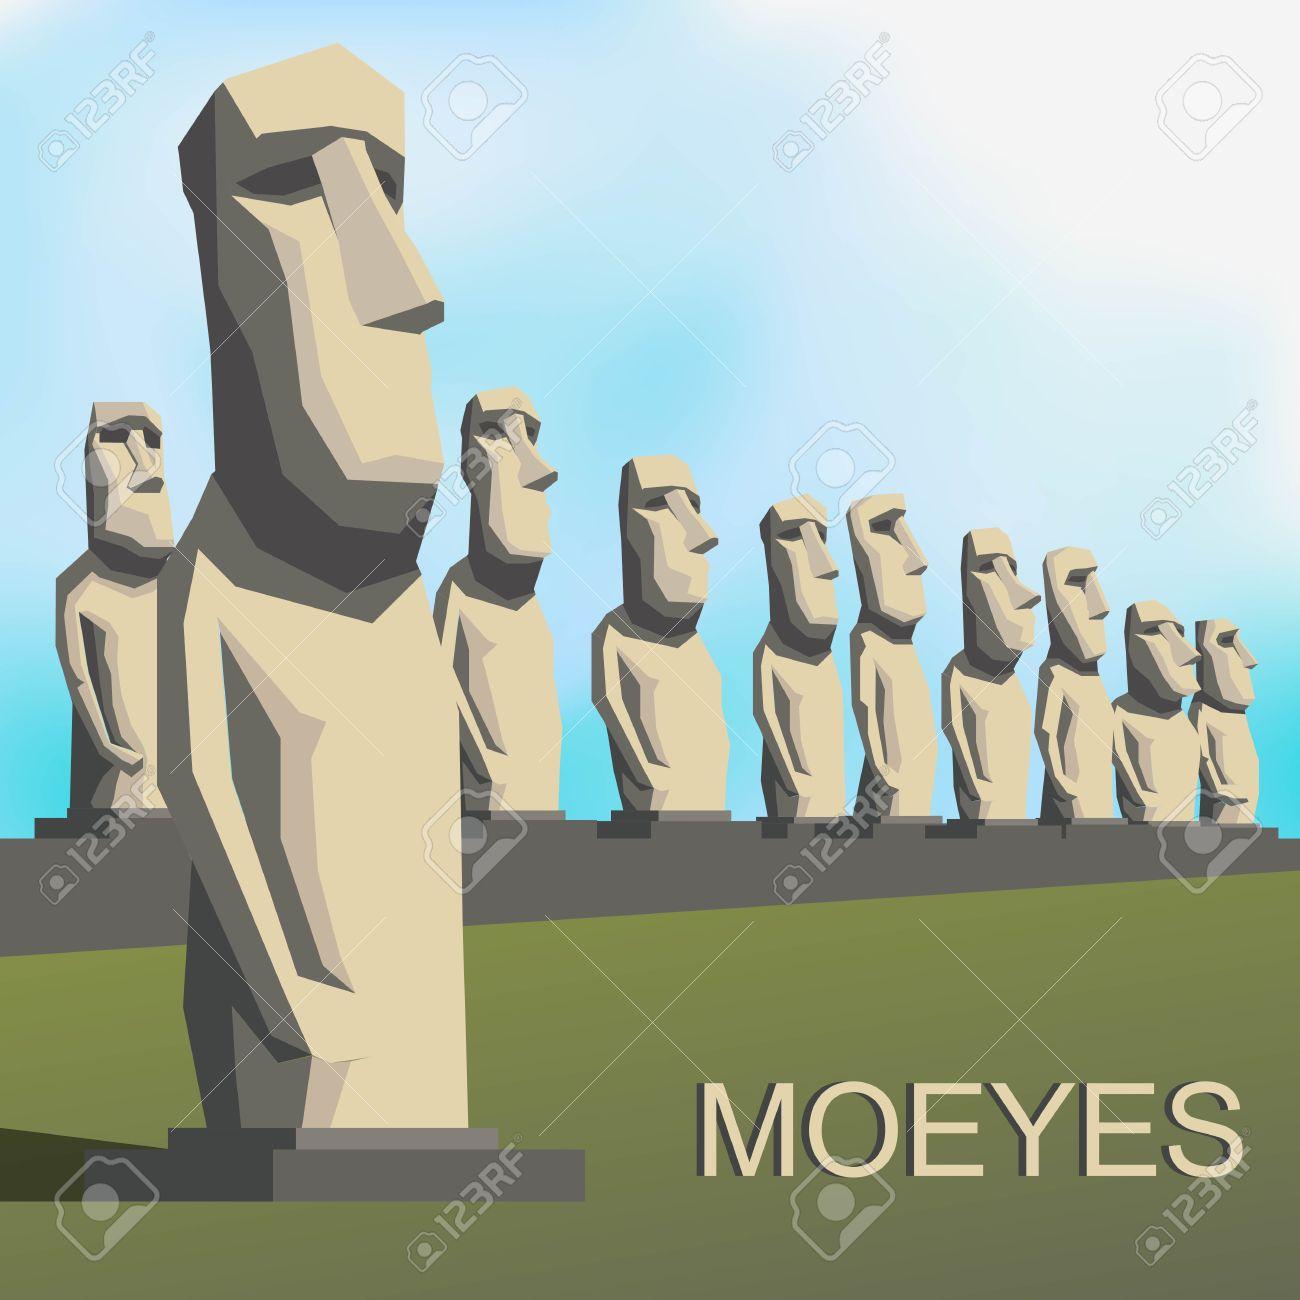 Moai Moeye Monolithic Human Figures By Rapa Nui People Royalty.